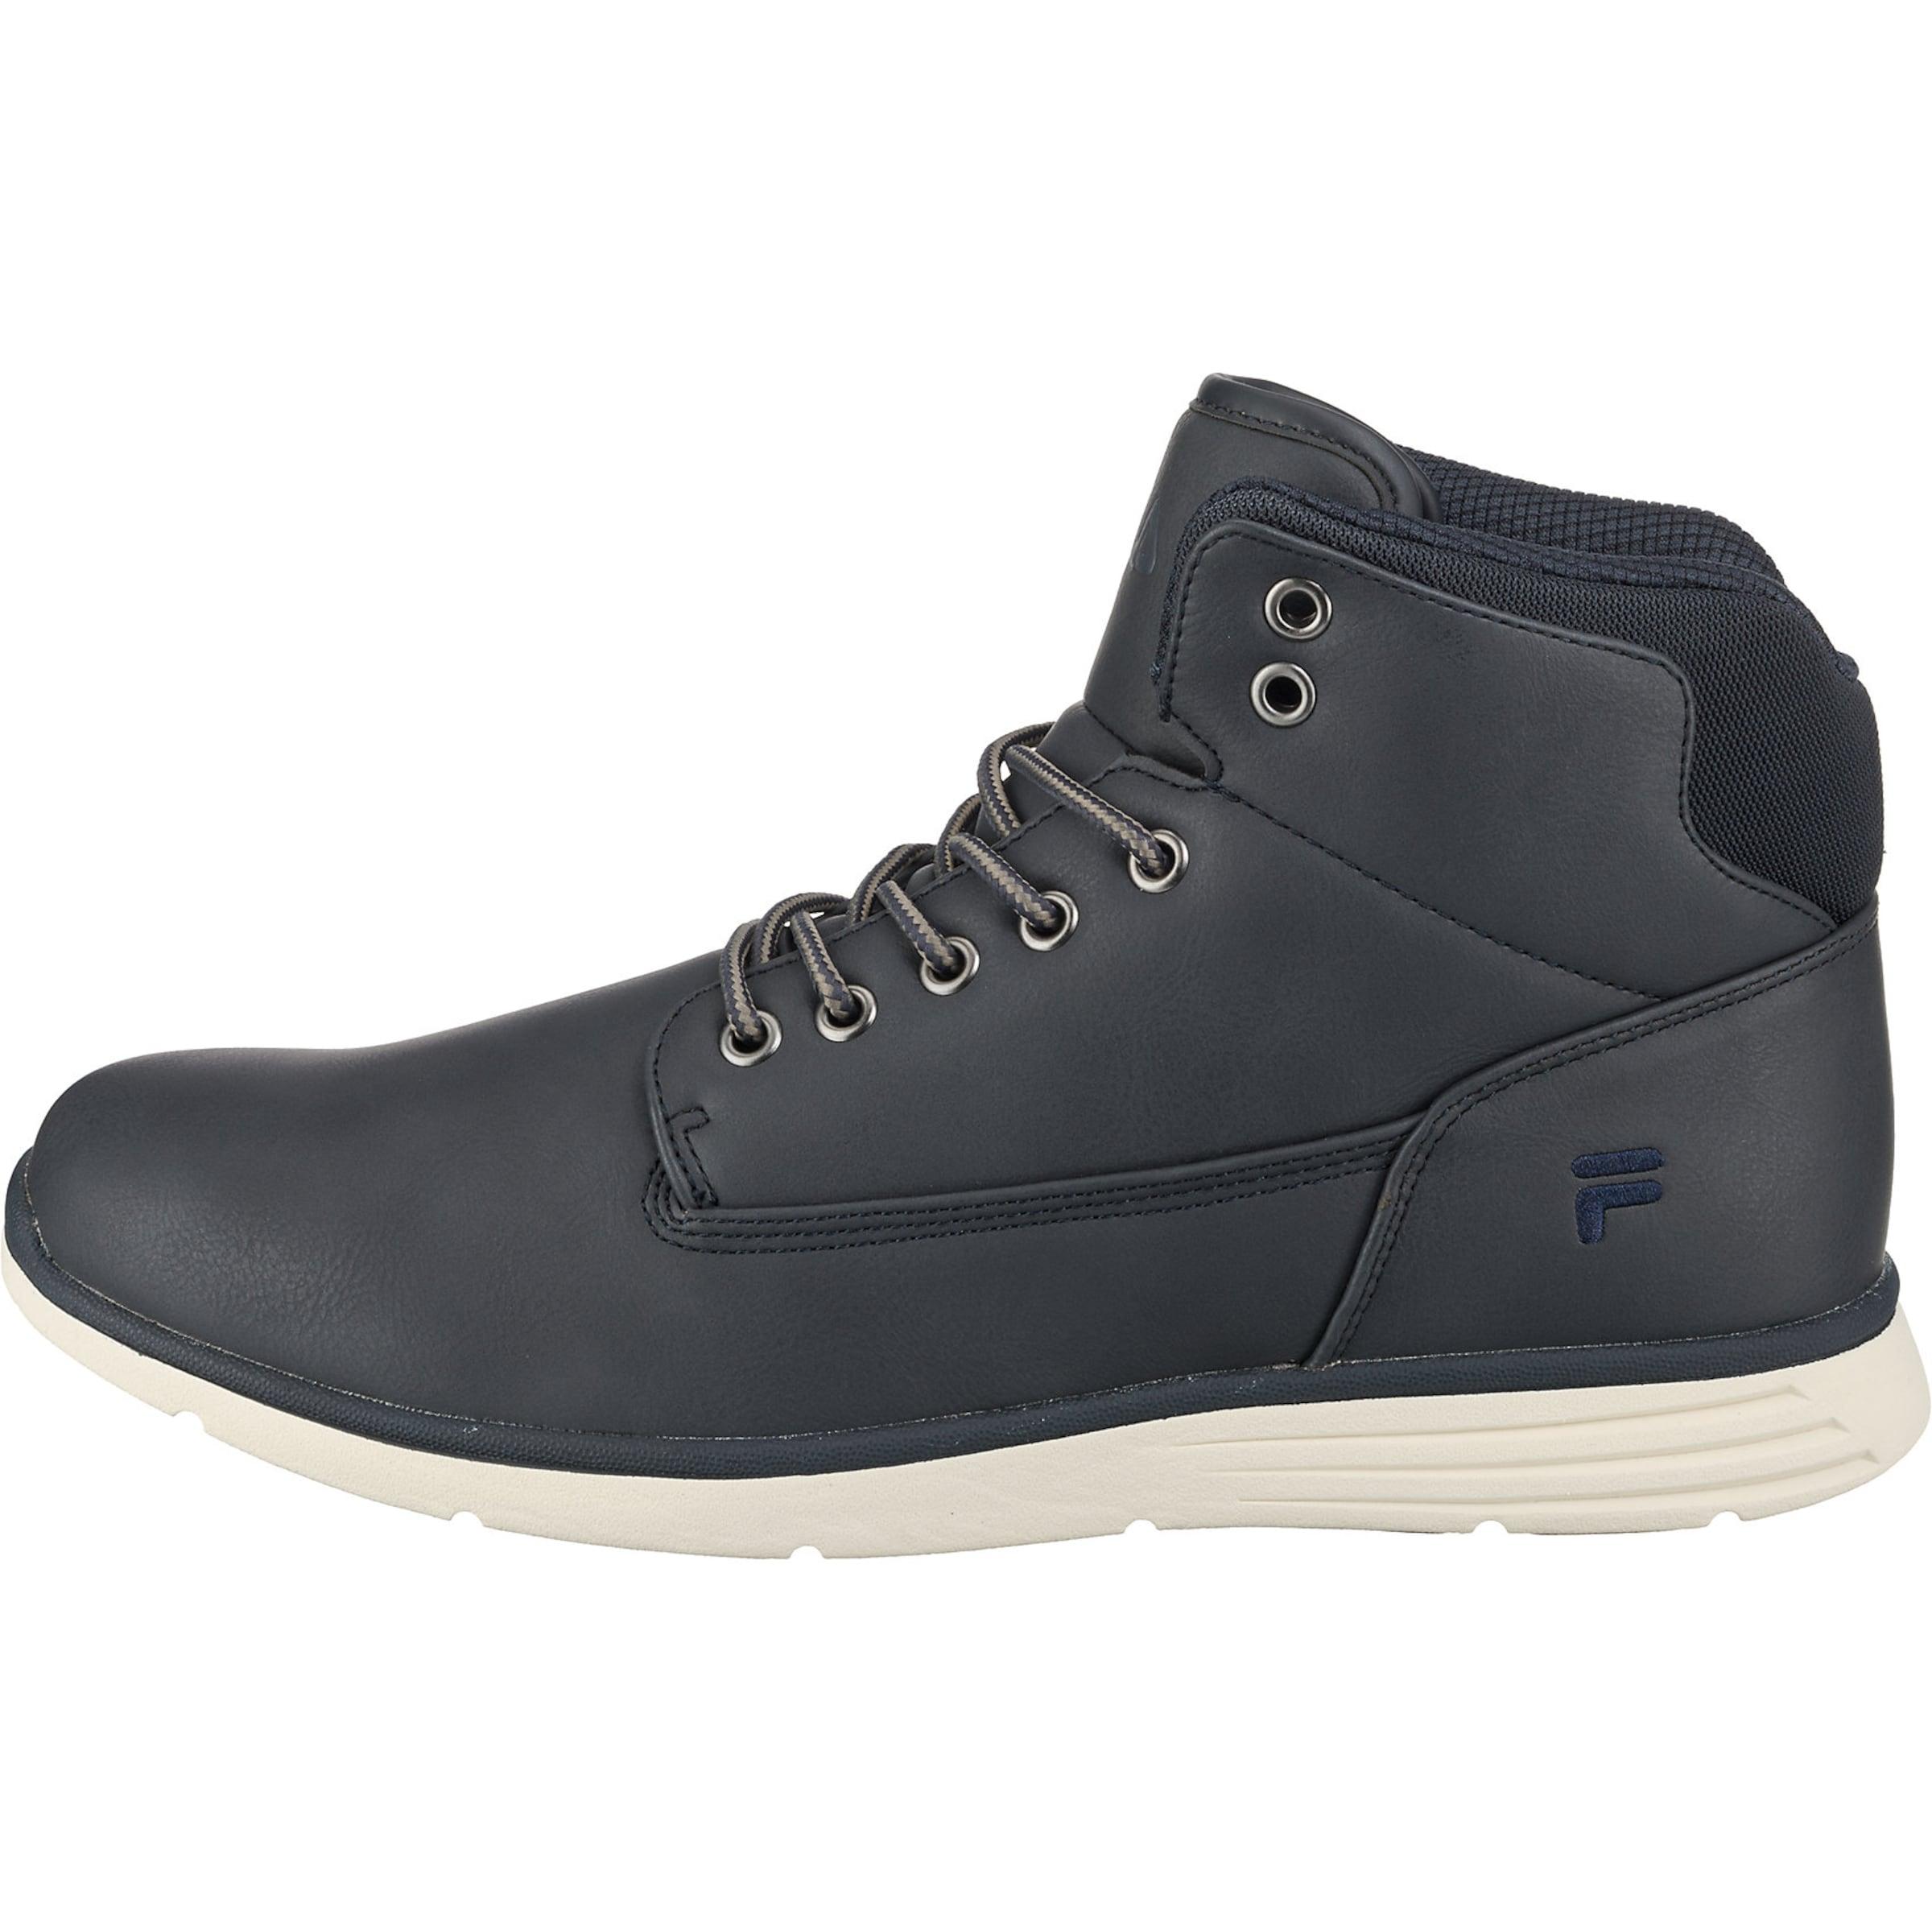 'lance' Sneakers Fila Fila In 'lance' Basaltgrau Sneakers Sneakers Fila In Basaltgrau iZTuOPkX